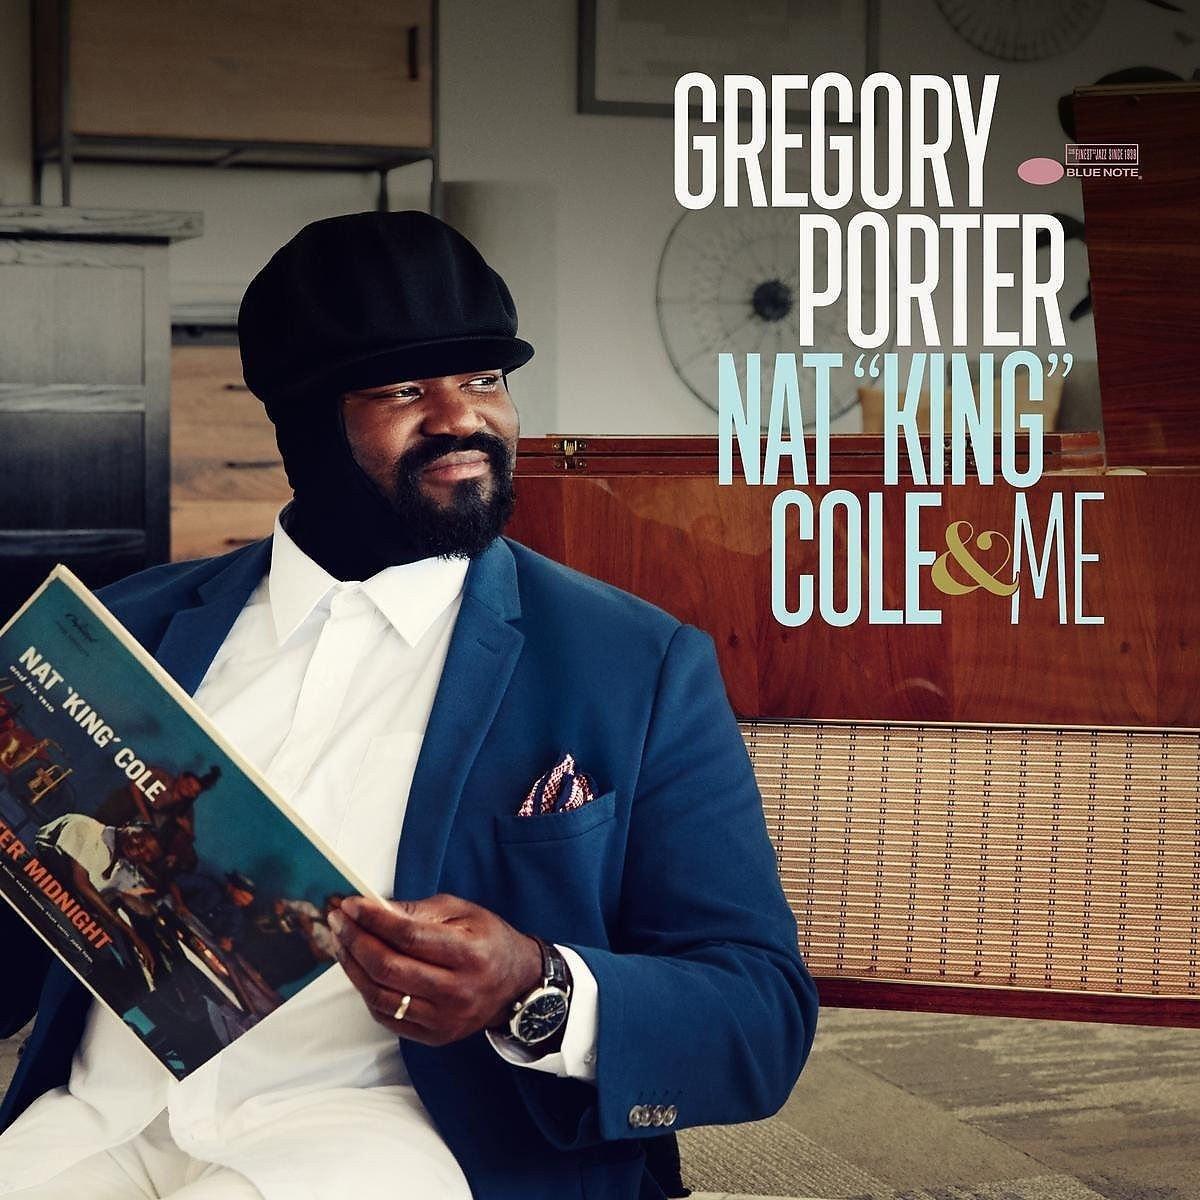 Nat King Cole & Me (Deluxe Edt.) - Gregory Porter: Amazon.de: Musik